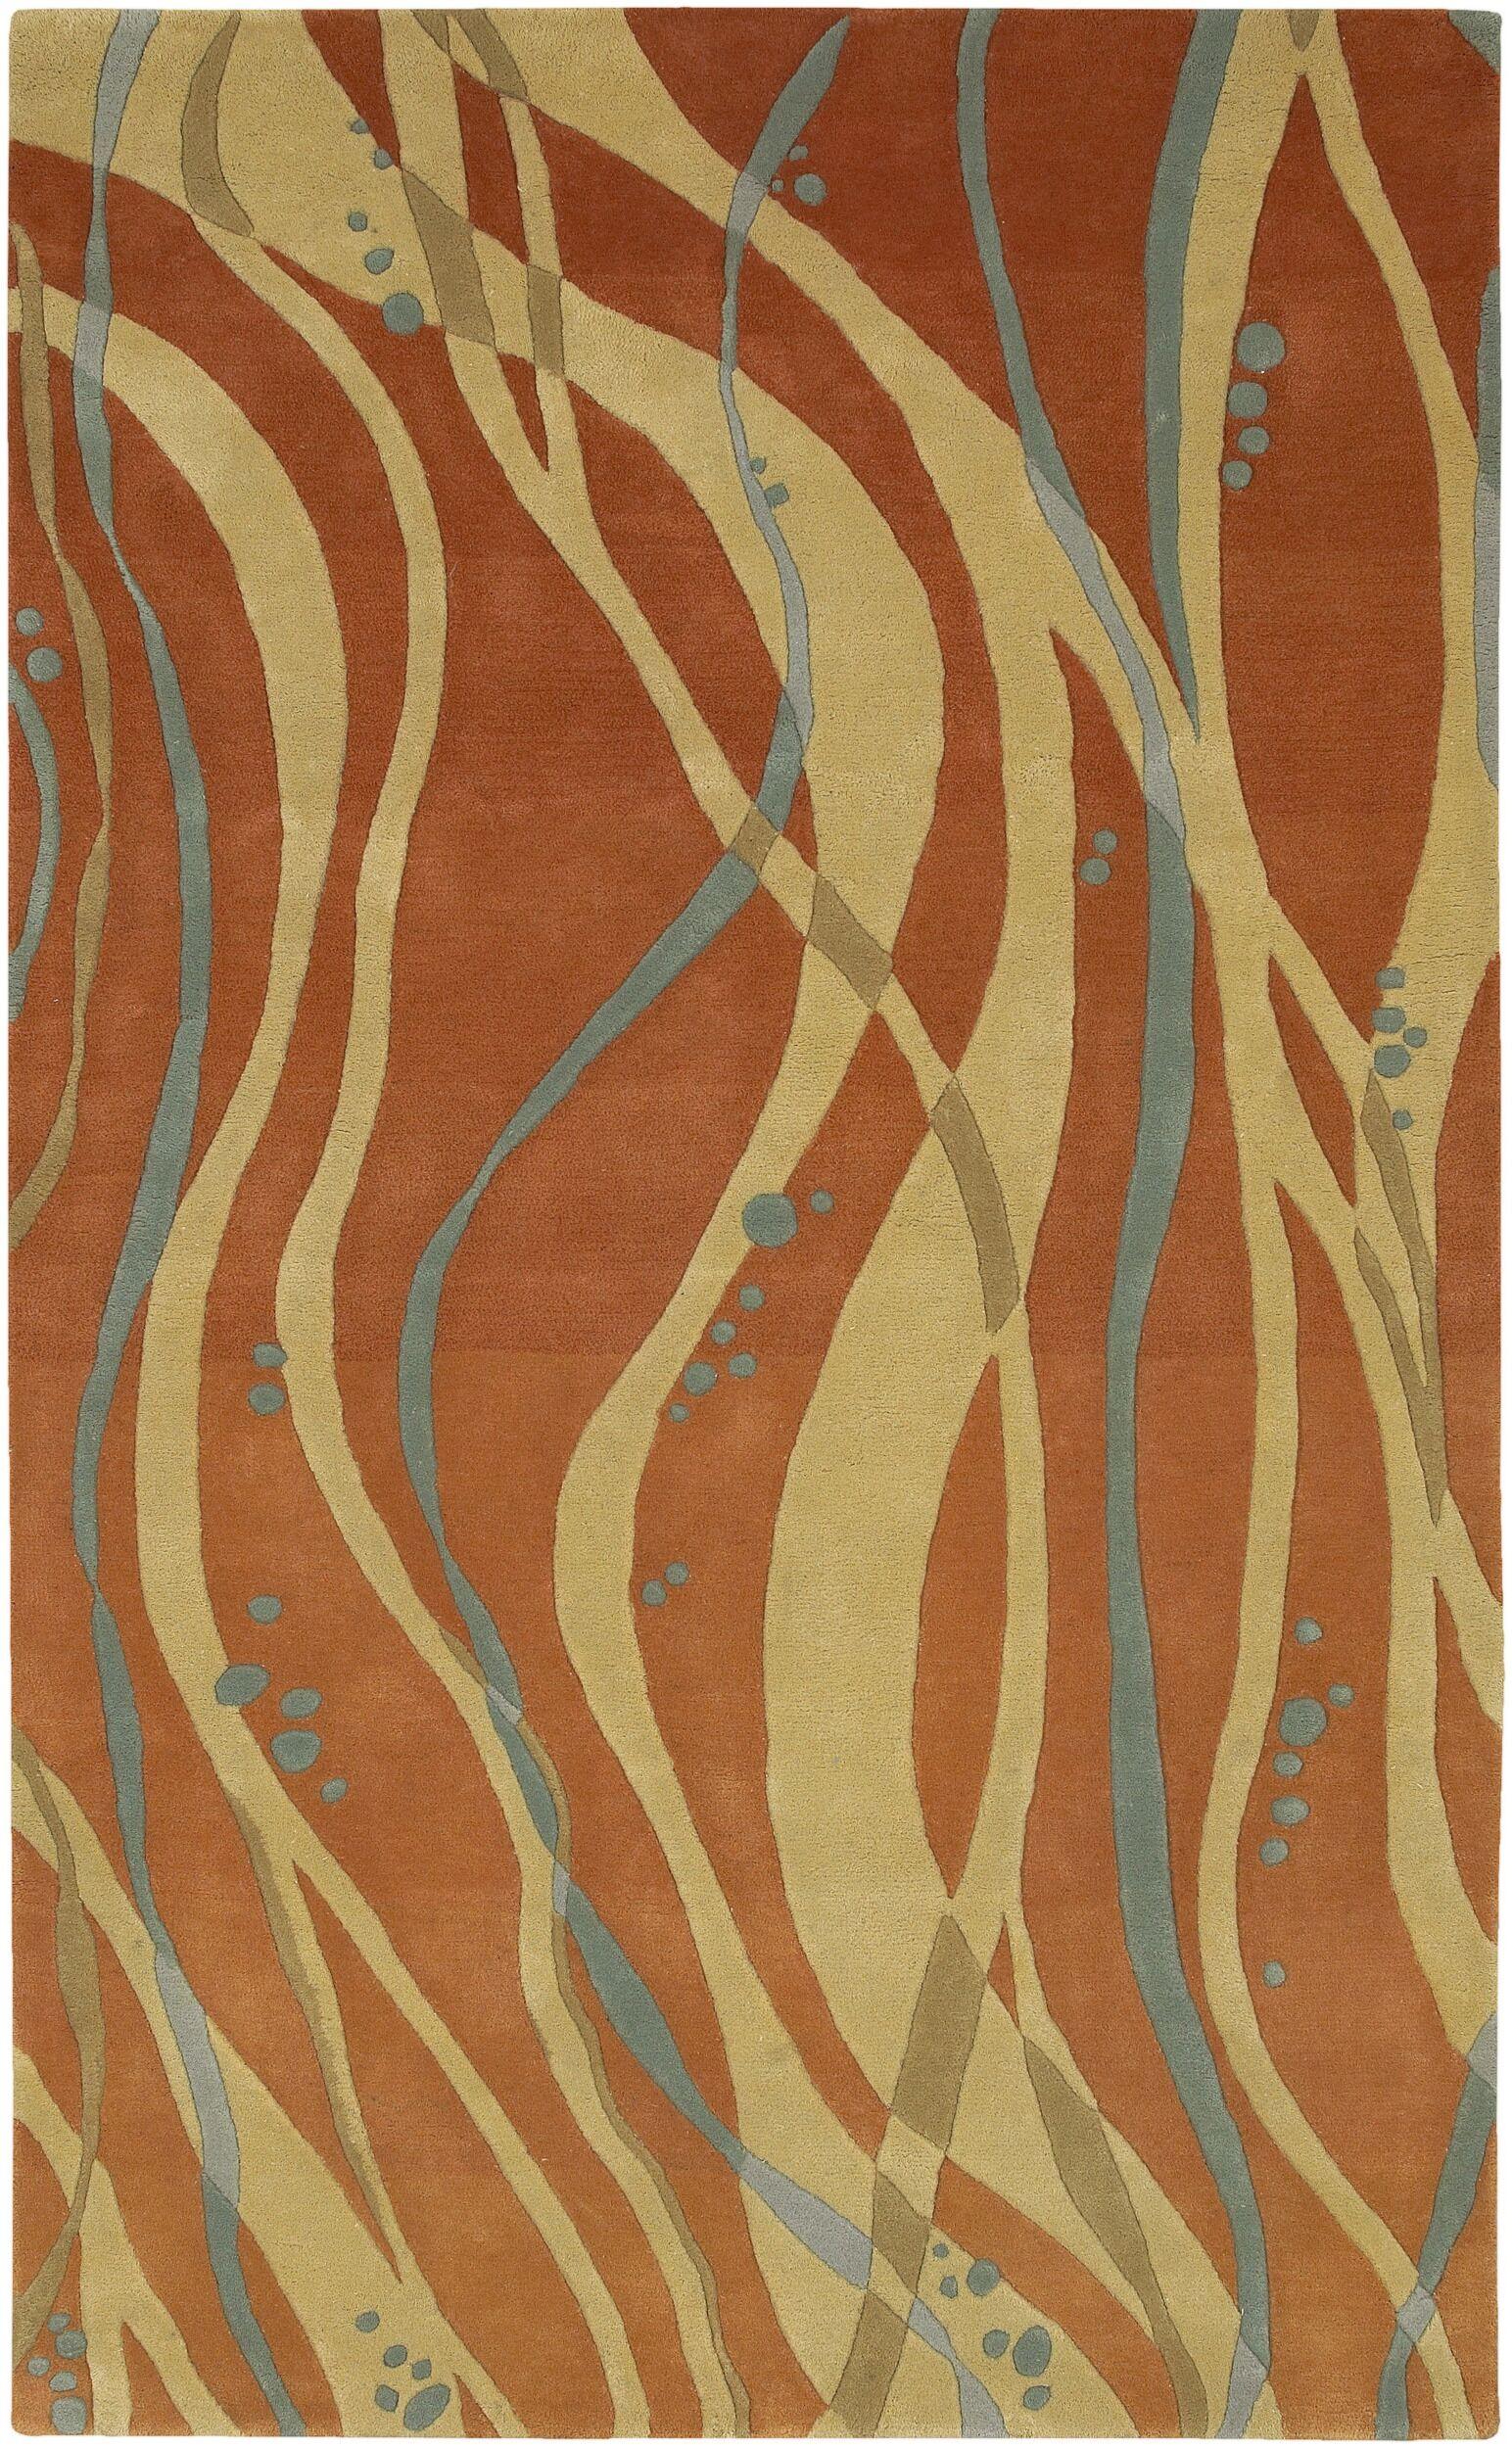 Macie Tangerine Rug Rug Size: Rectangle 8' x 11'